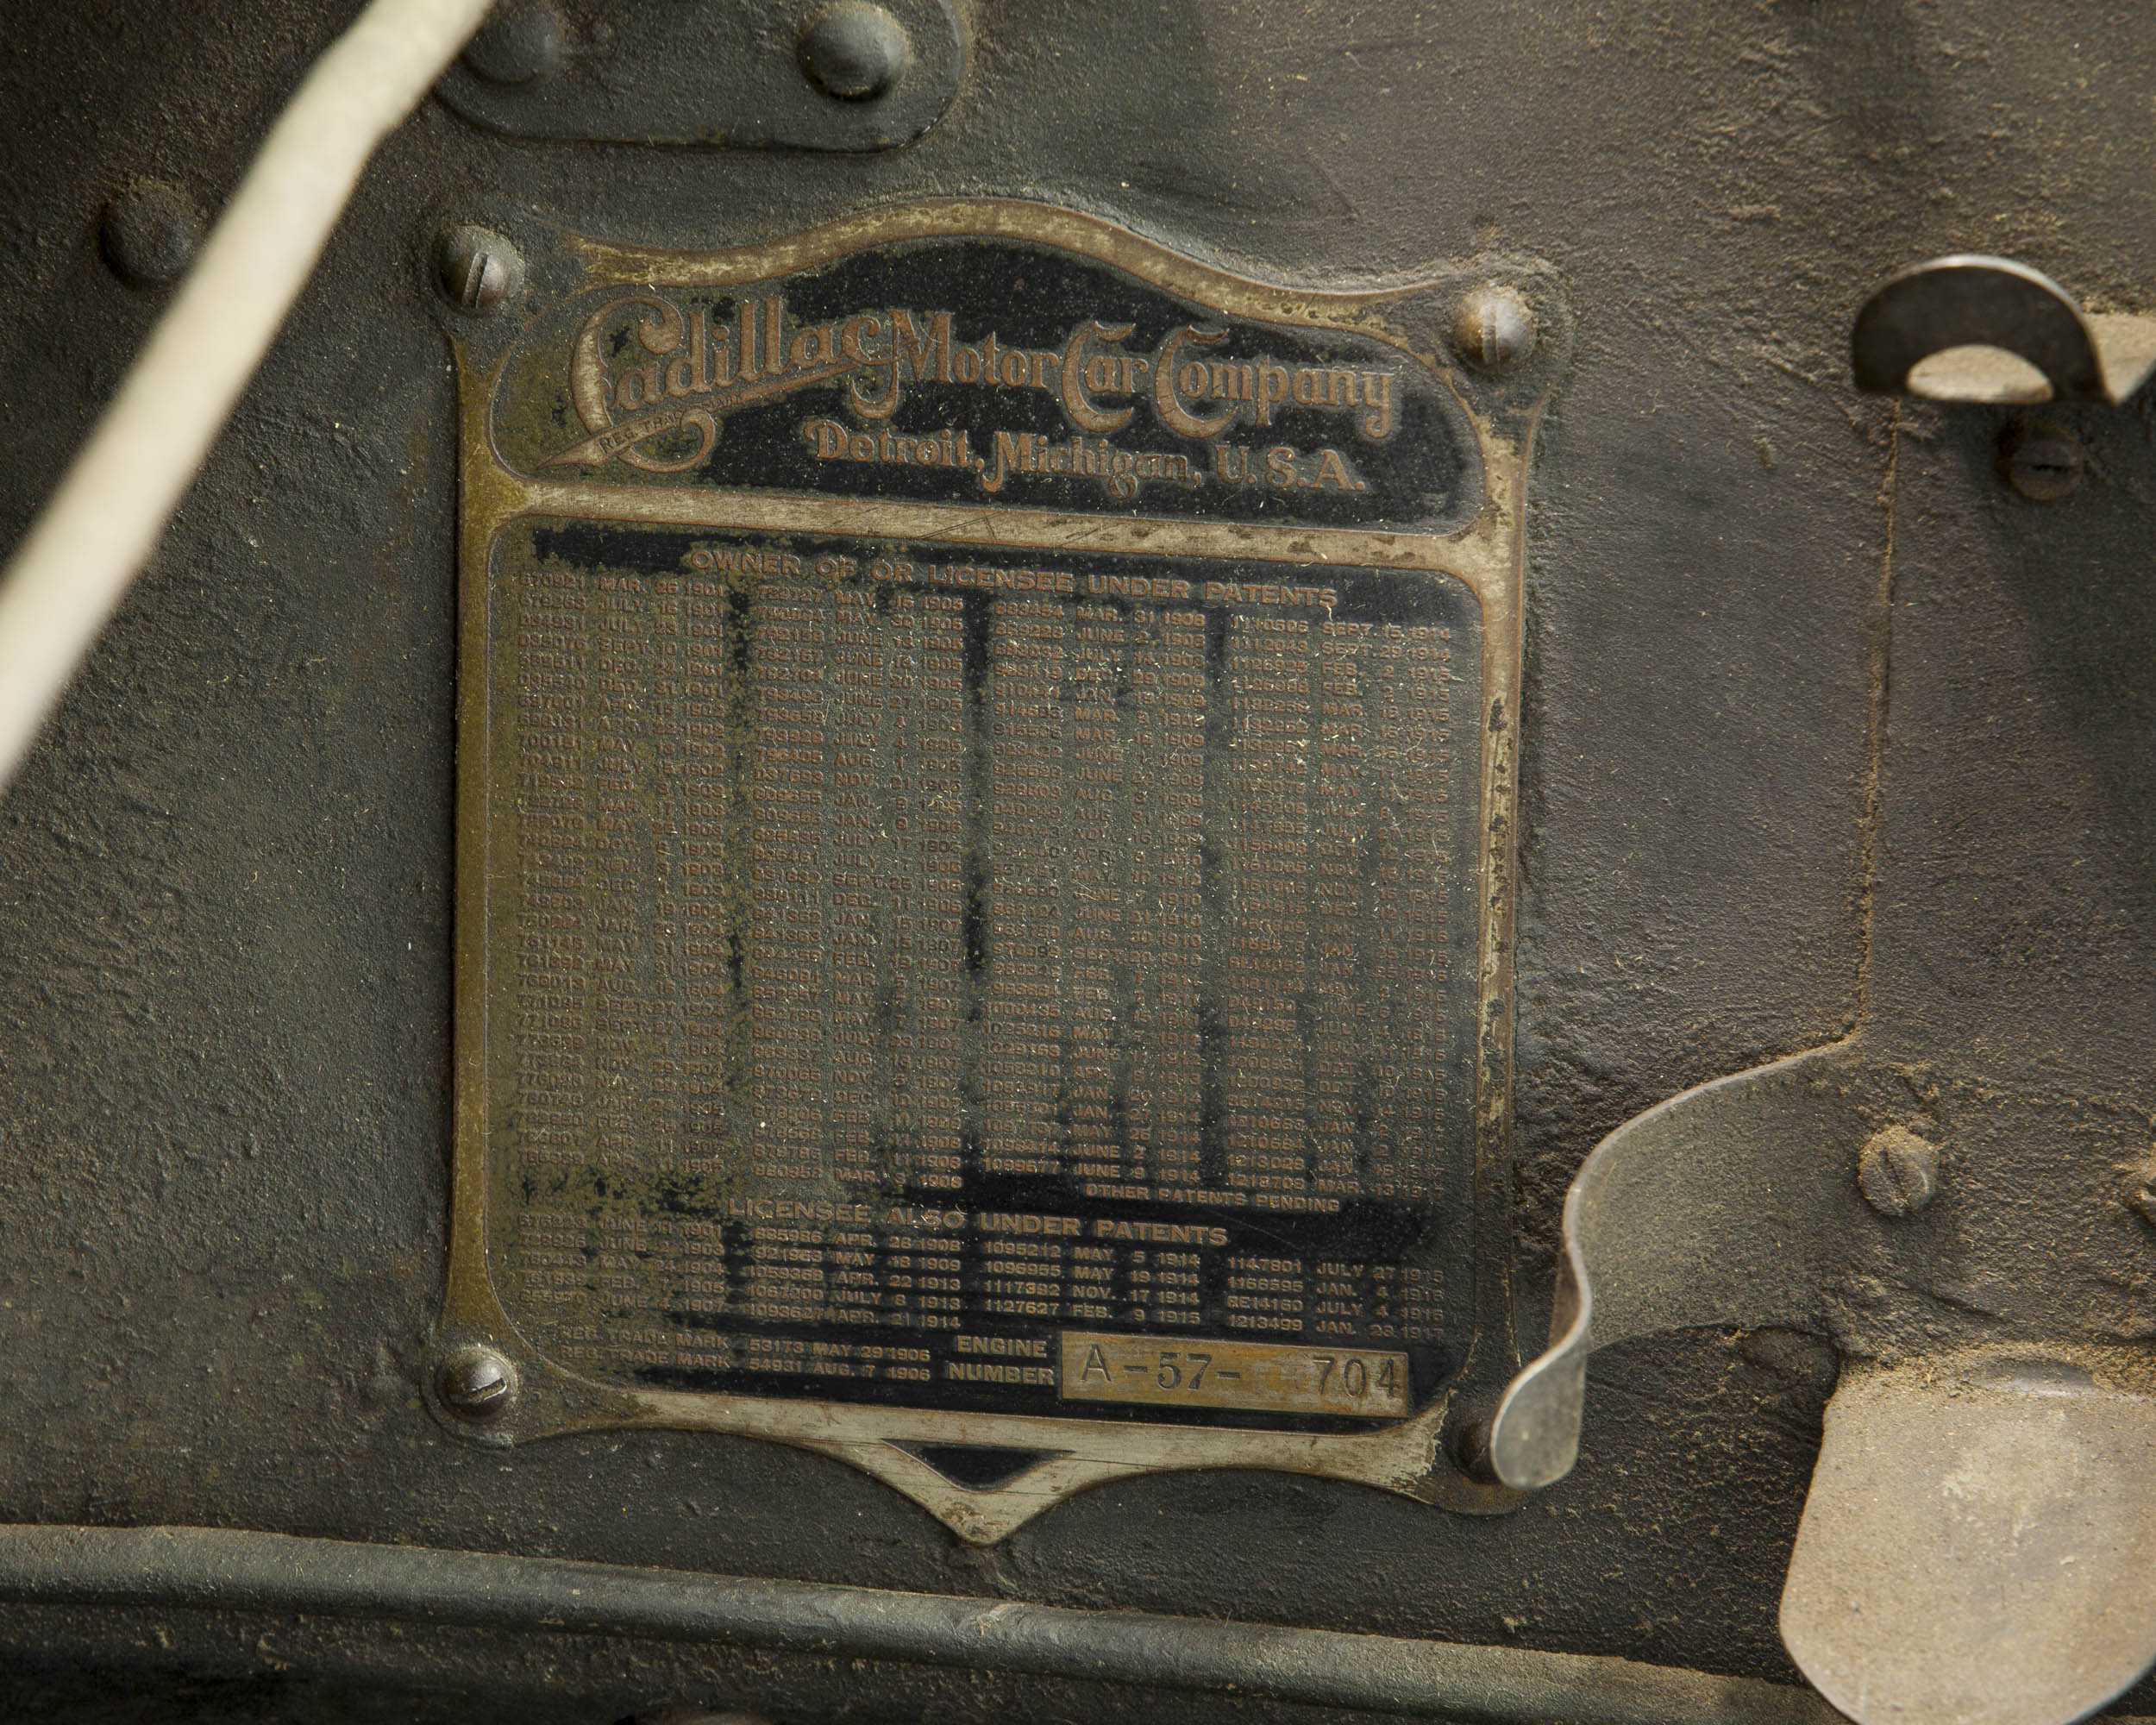 1918 Cadillac Type 57 body tag